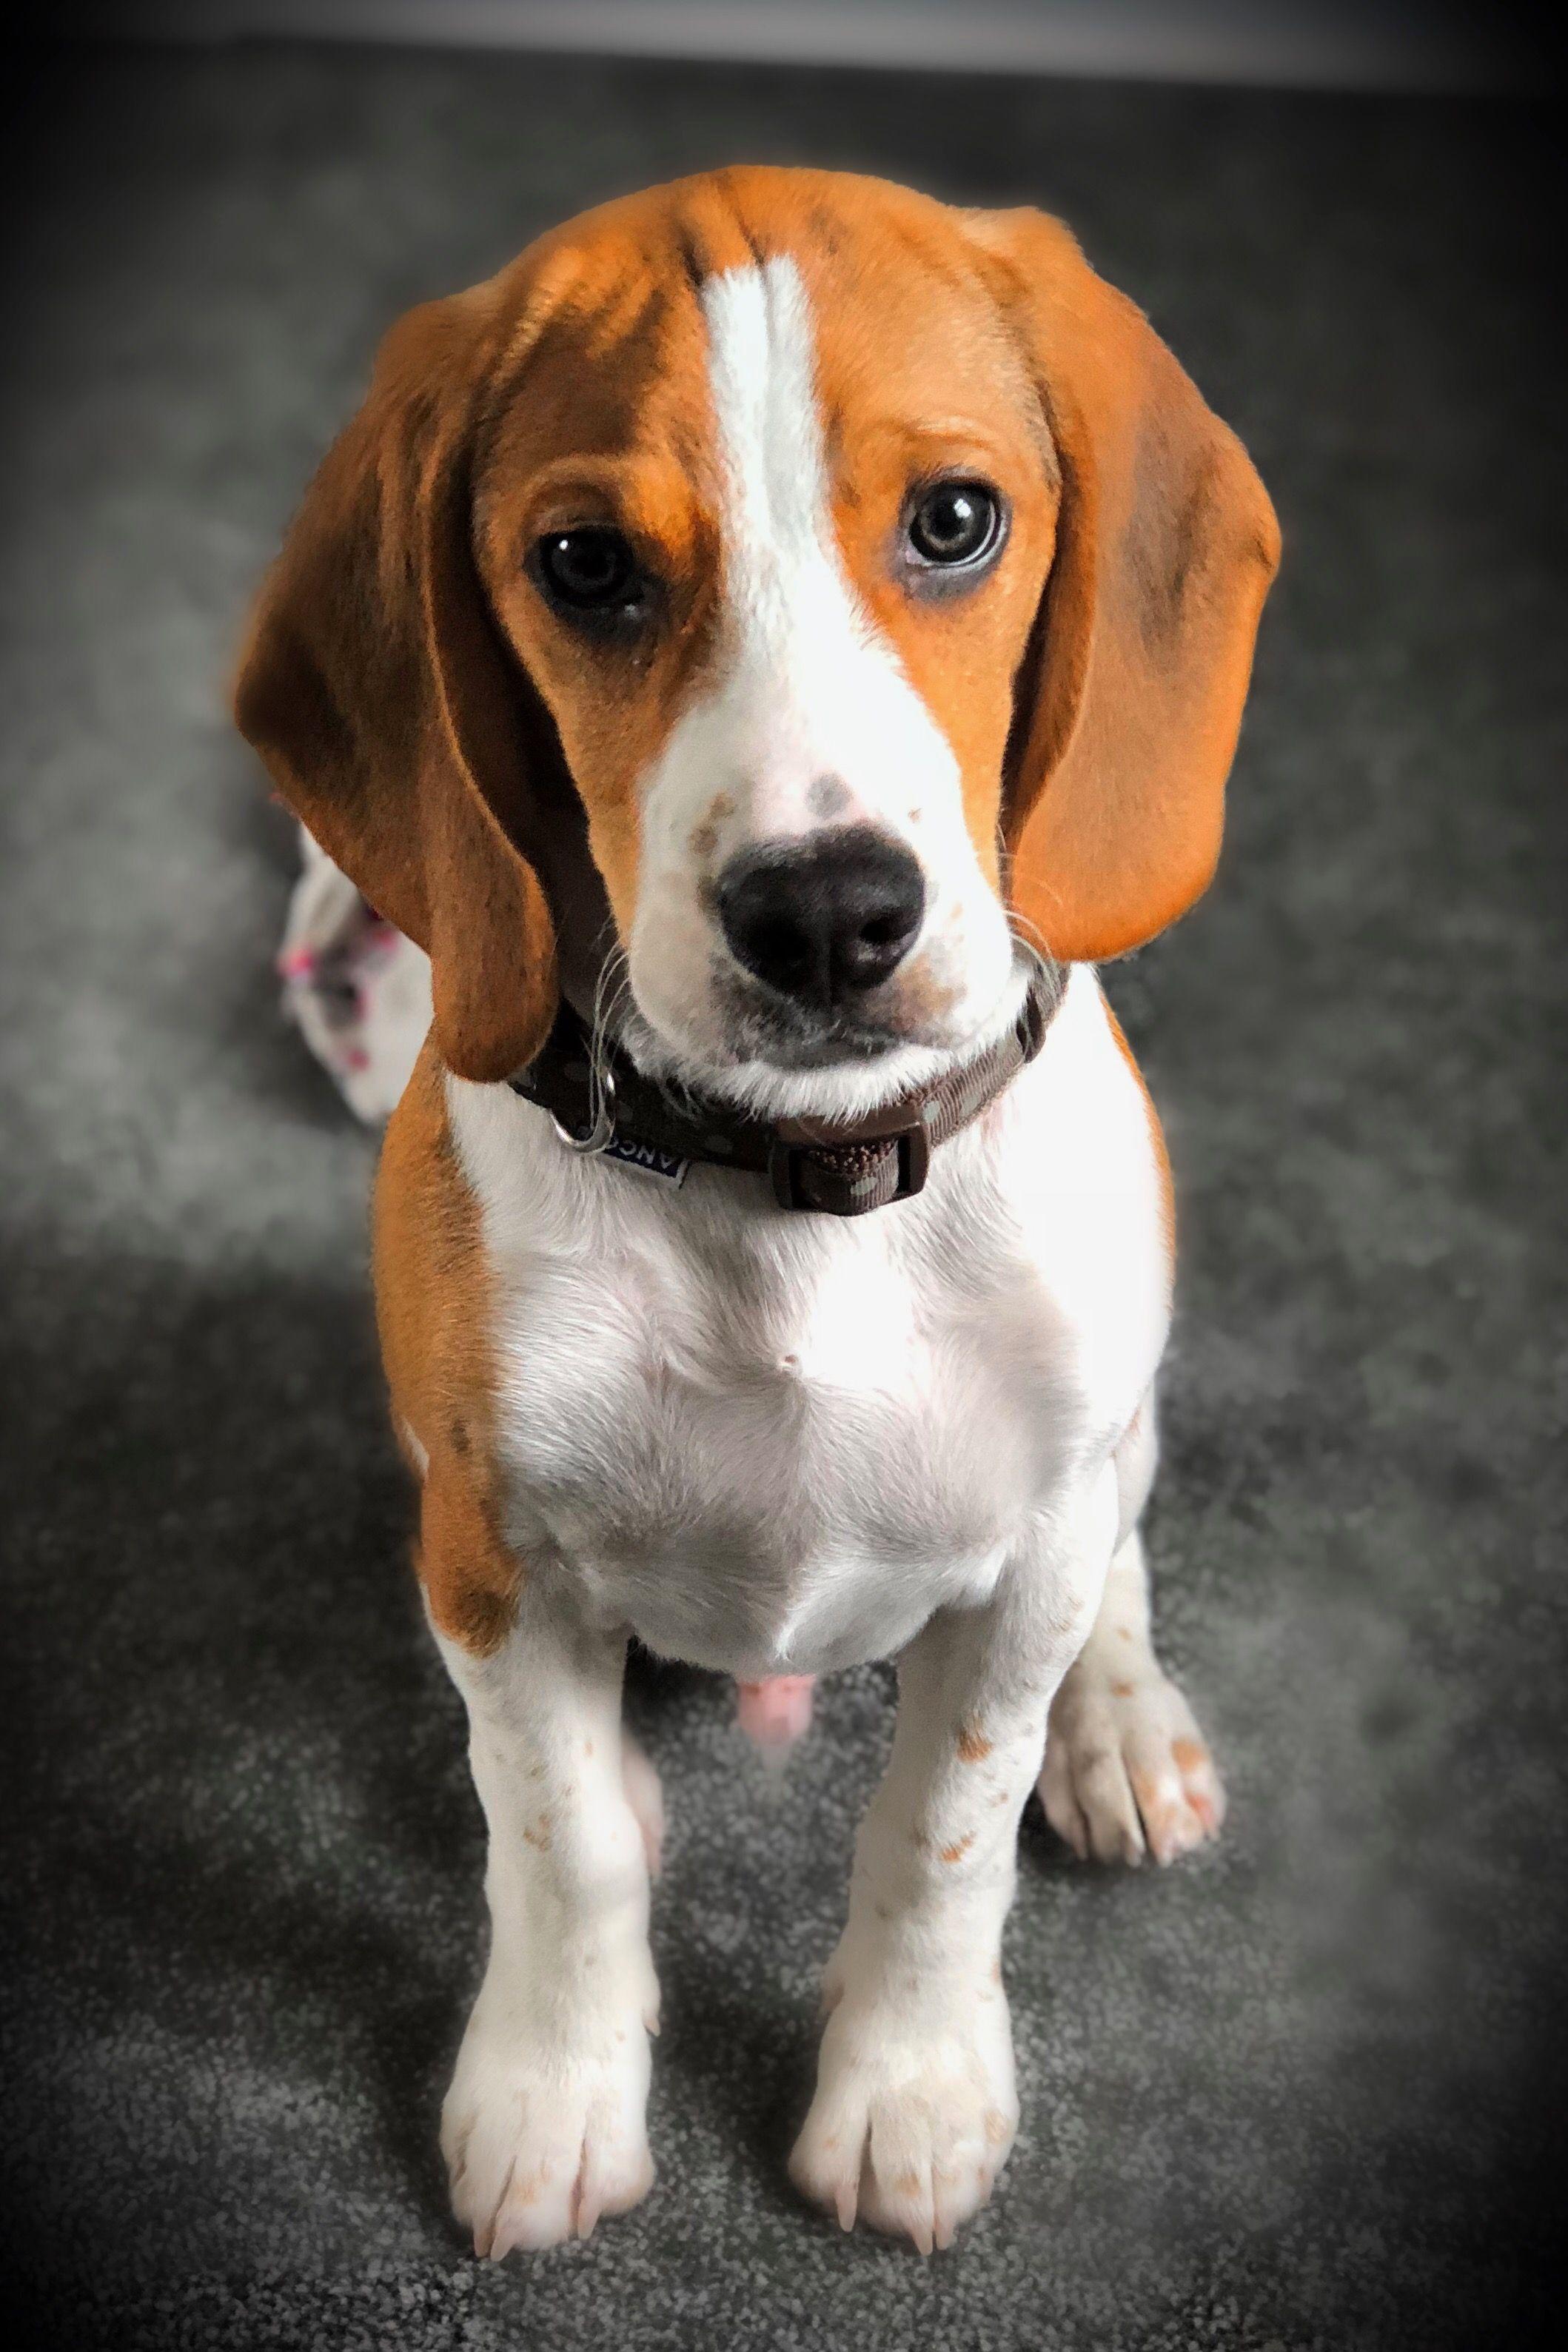 Loki My Beagle At 14 Weeks Beagle Dogs